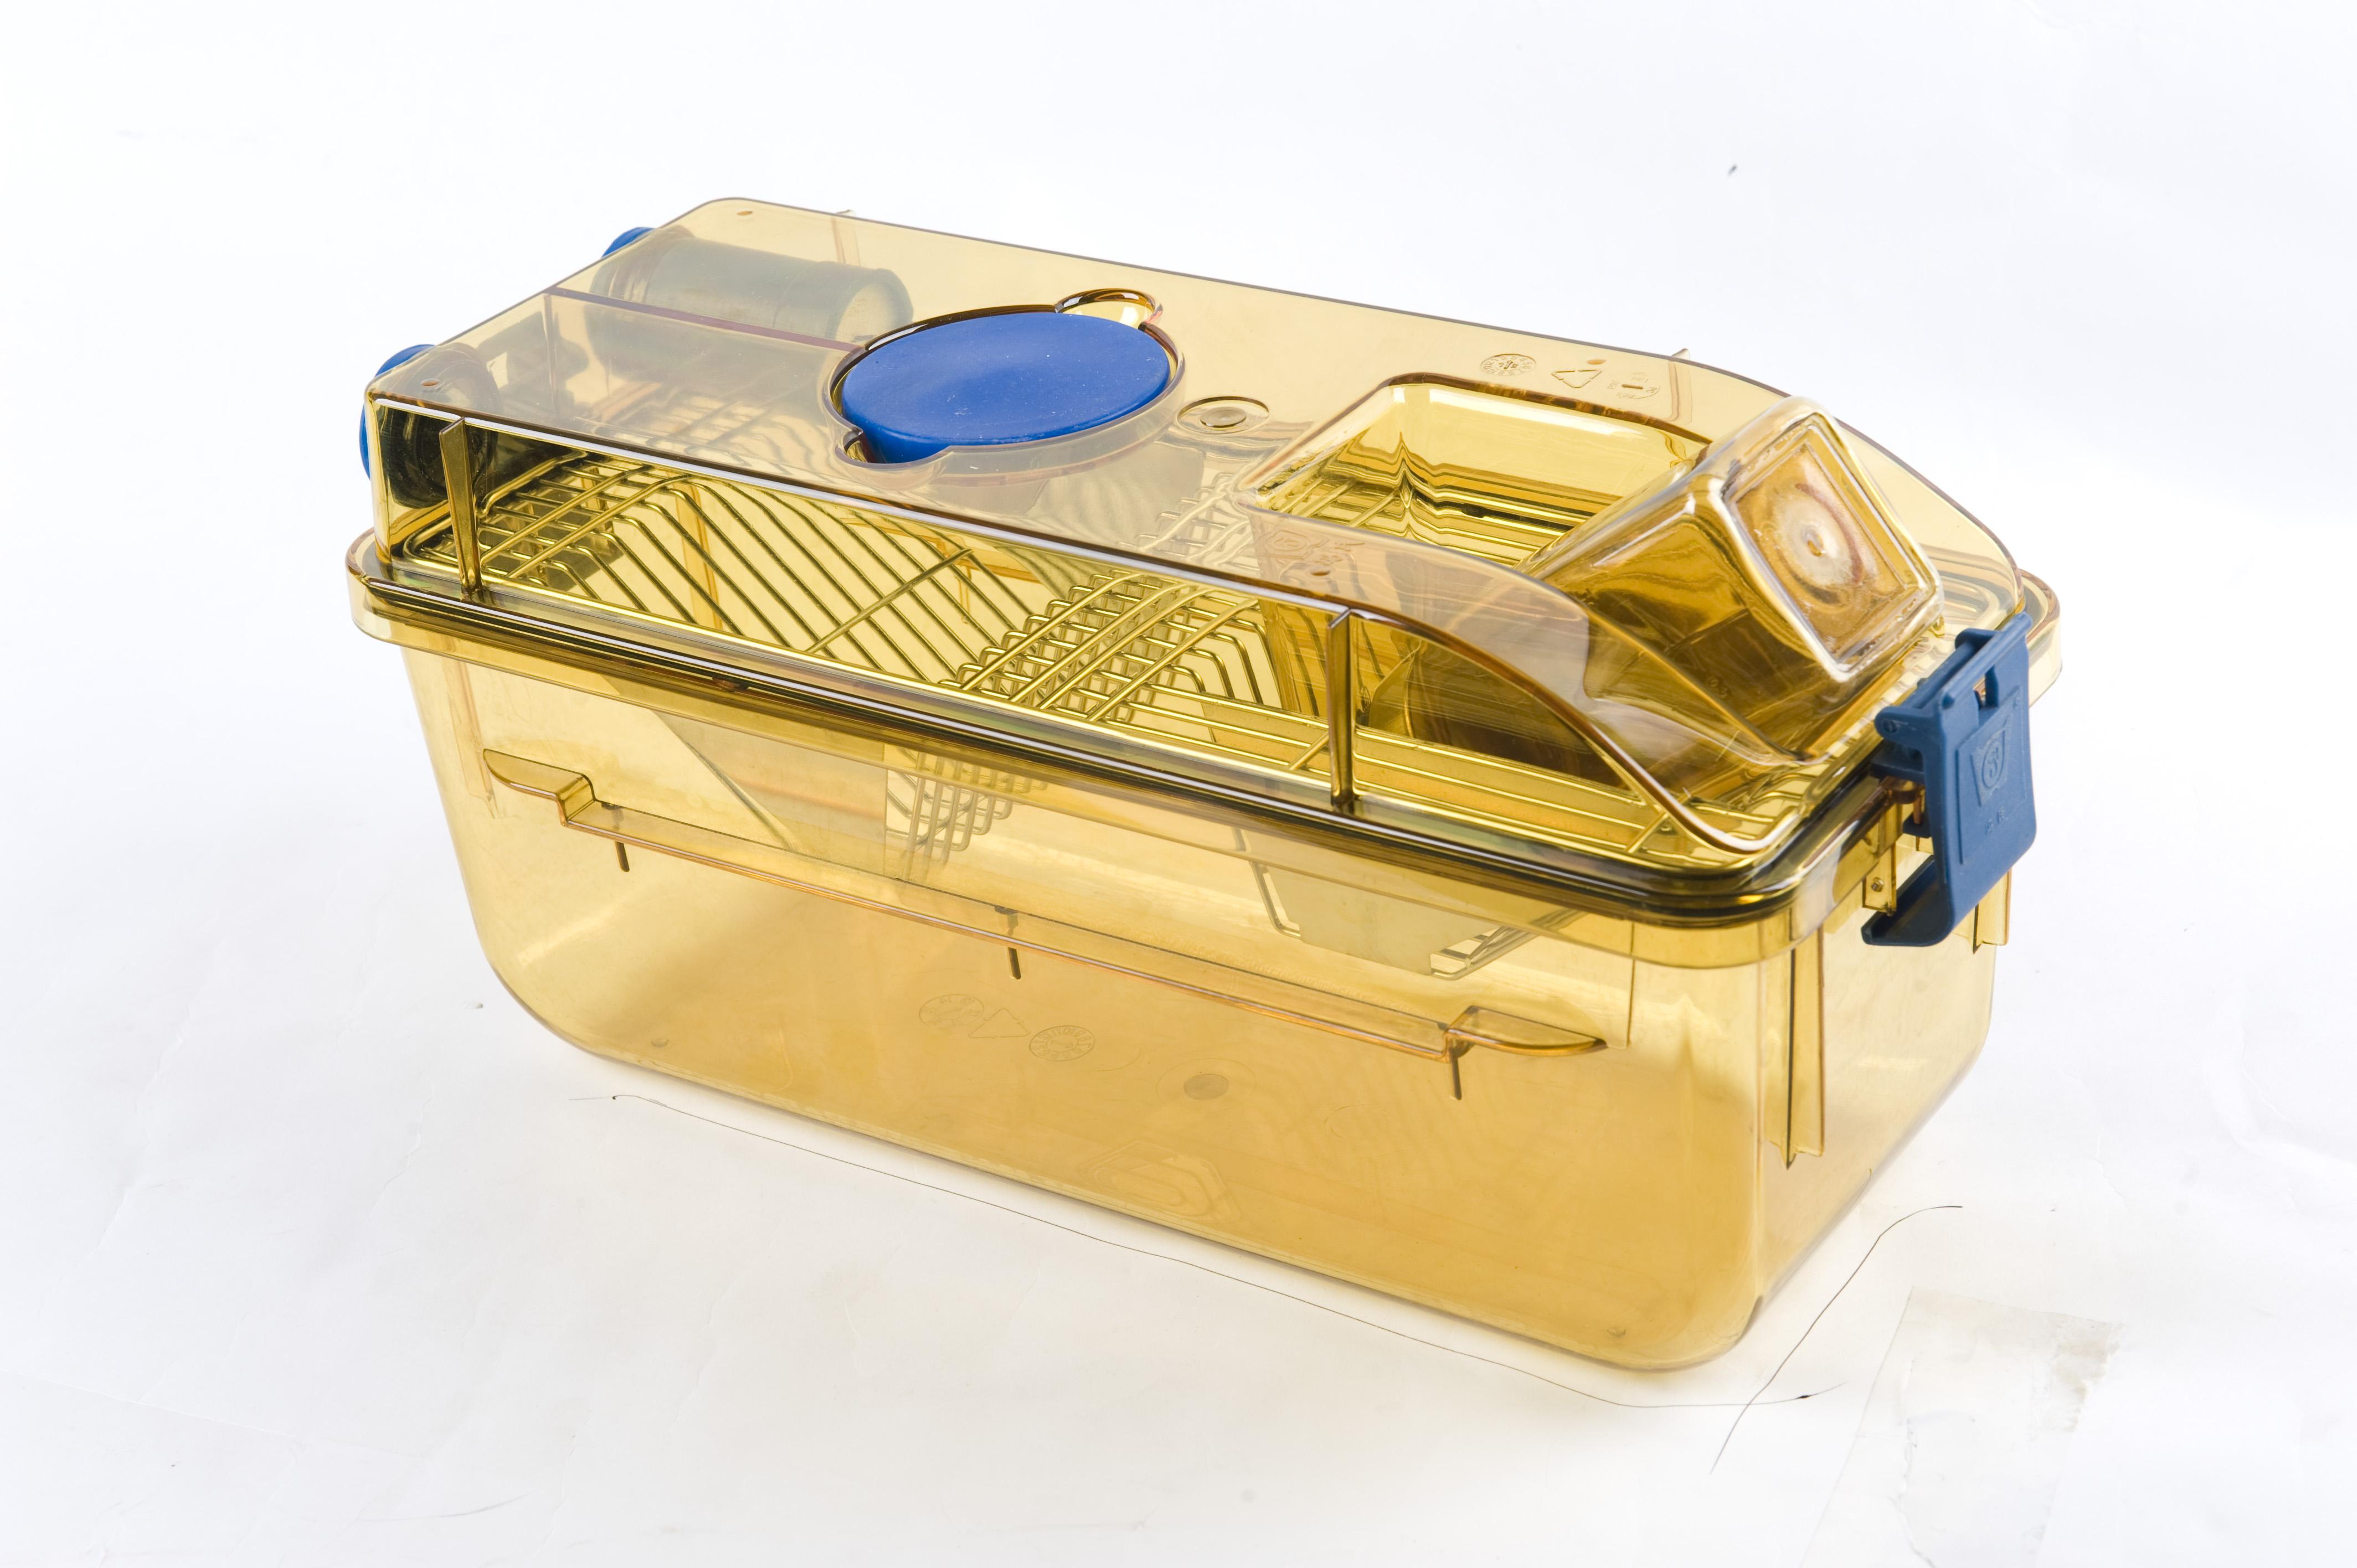 IVC小鼠籠盒(外置式)